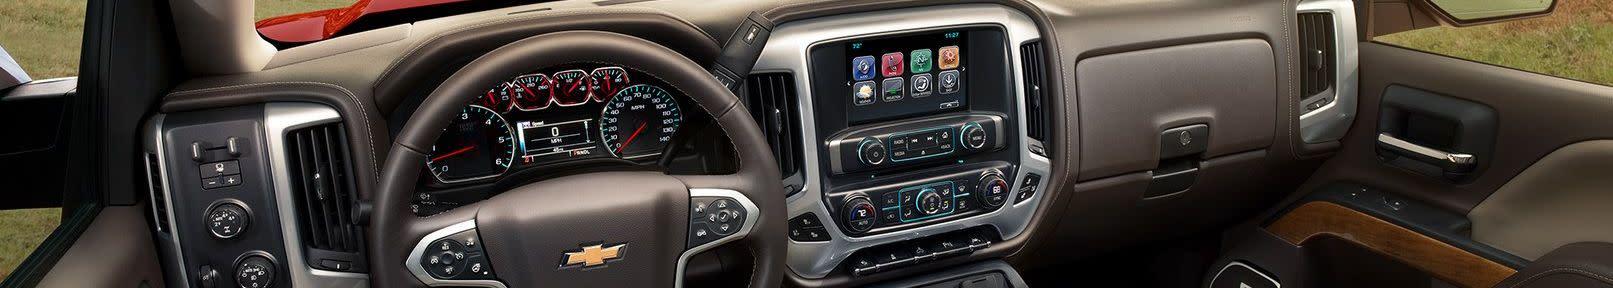 2019 Chevrolet Silverado 1500 Center Console